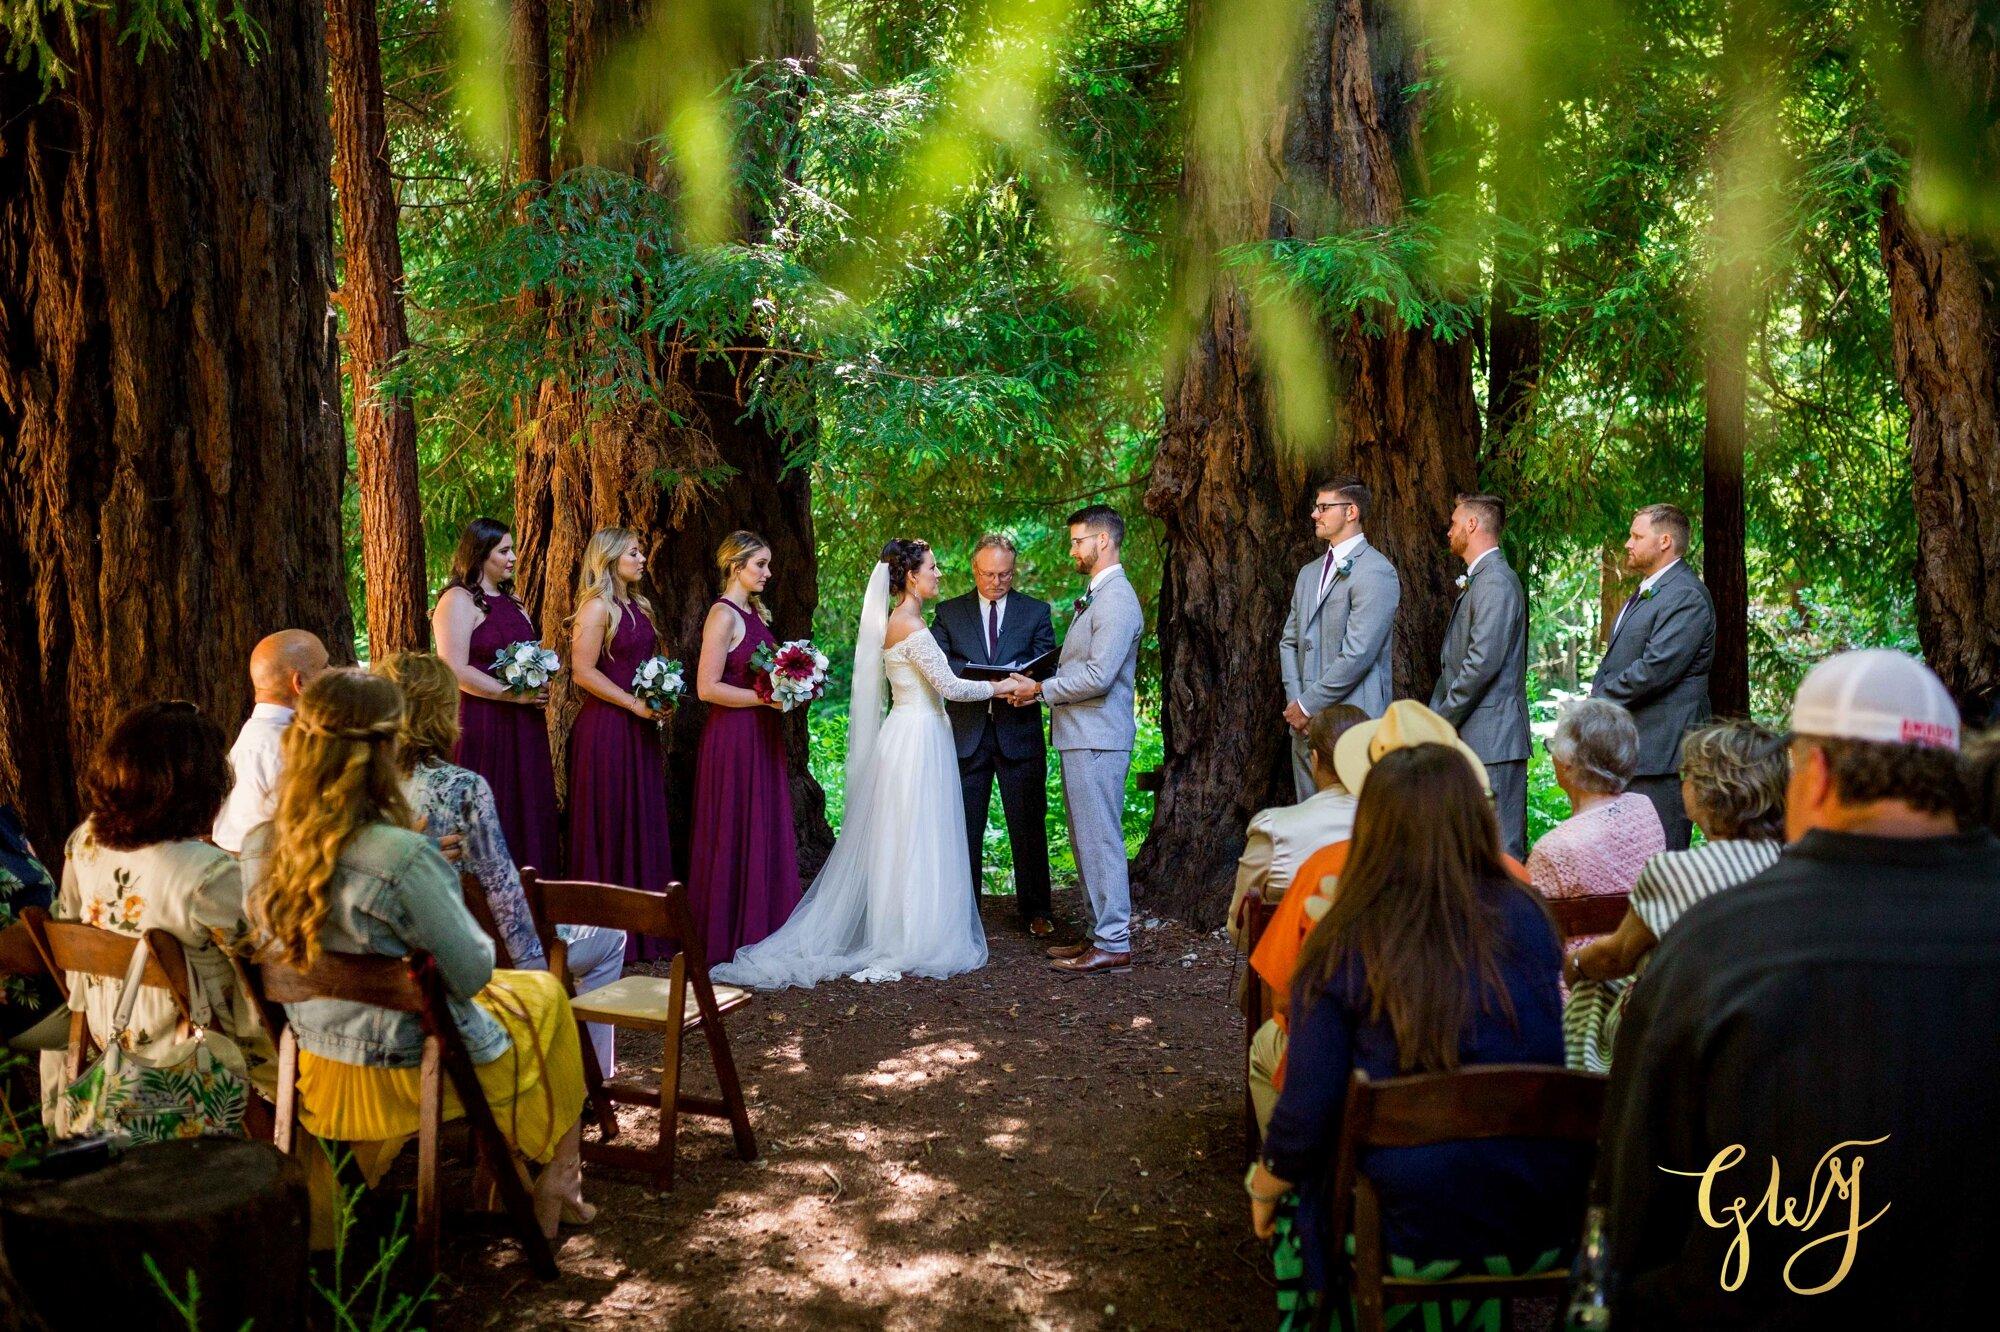 Casey + Jordan's Intimate Big Sur Elopement in the Redwoods by Glass Woods Media 37.jpg